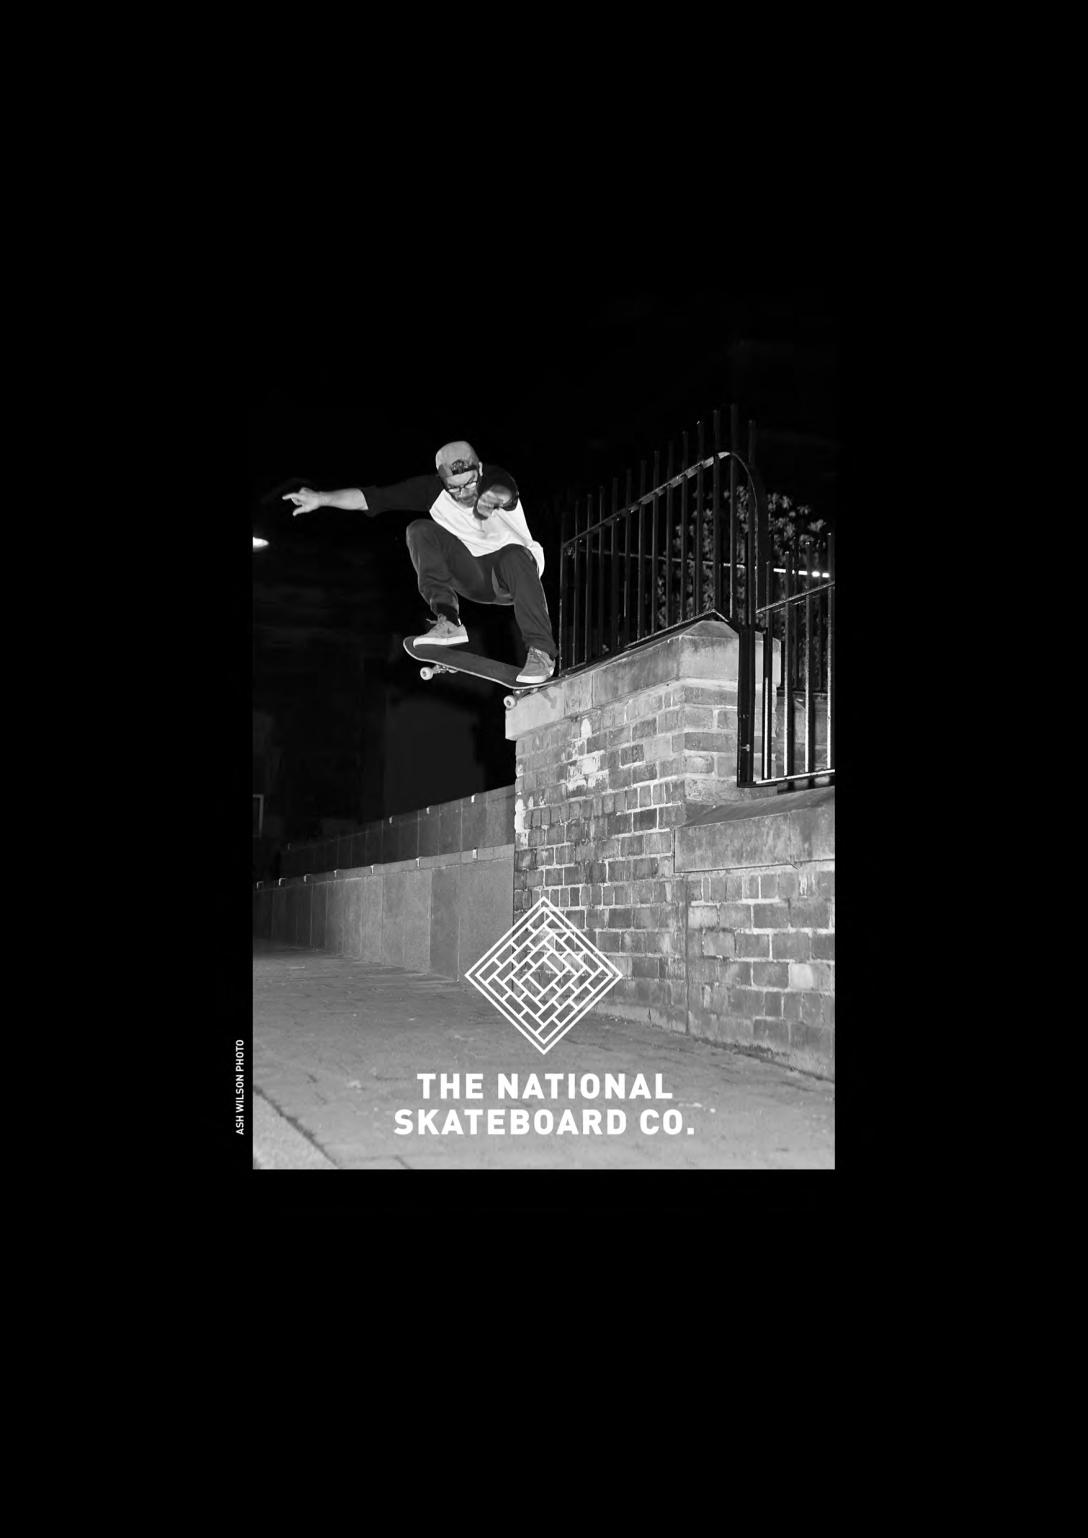 David Mackey crooked grind The National Skateboard Co advert photo Ash Wilson Speedway Skateboarding Magazine